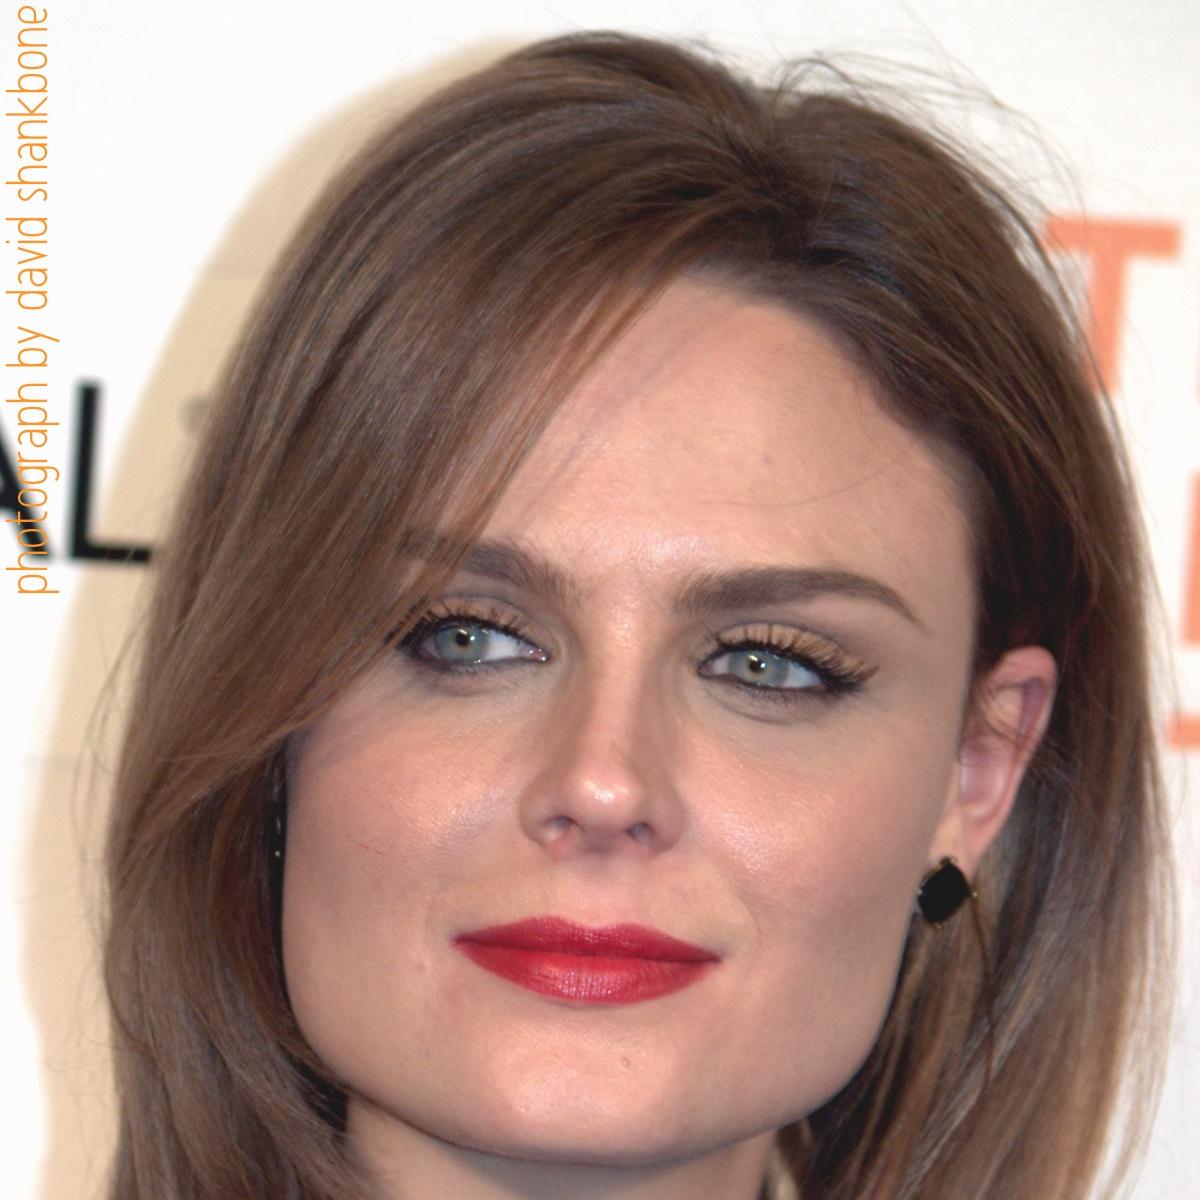 http://1.bp.blogspot.com/__UQSIjH59iA/TIByflXEFJI/AAAAAAAAFr4/GlDf3r9t6SY/s1600/Emily-Deschanel-Face-1200x1200-Pixels.jpg